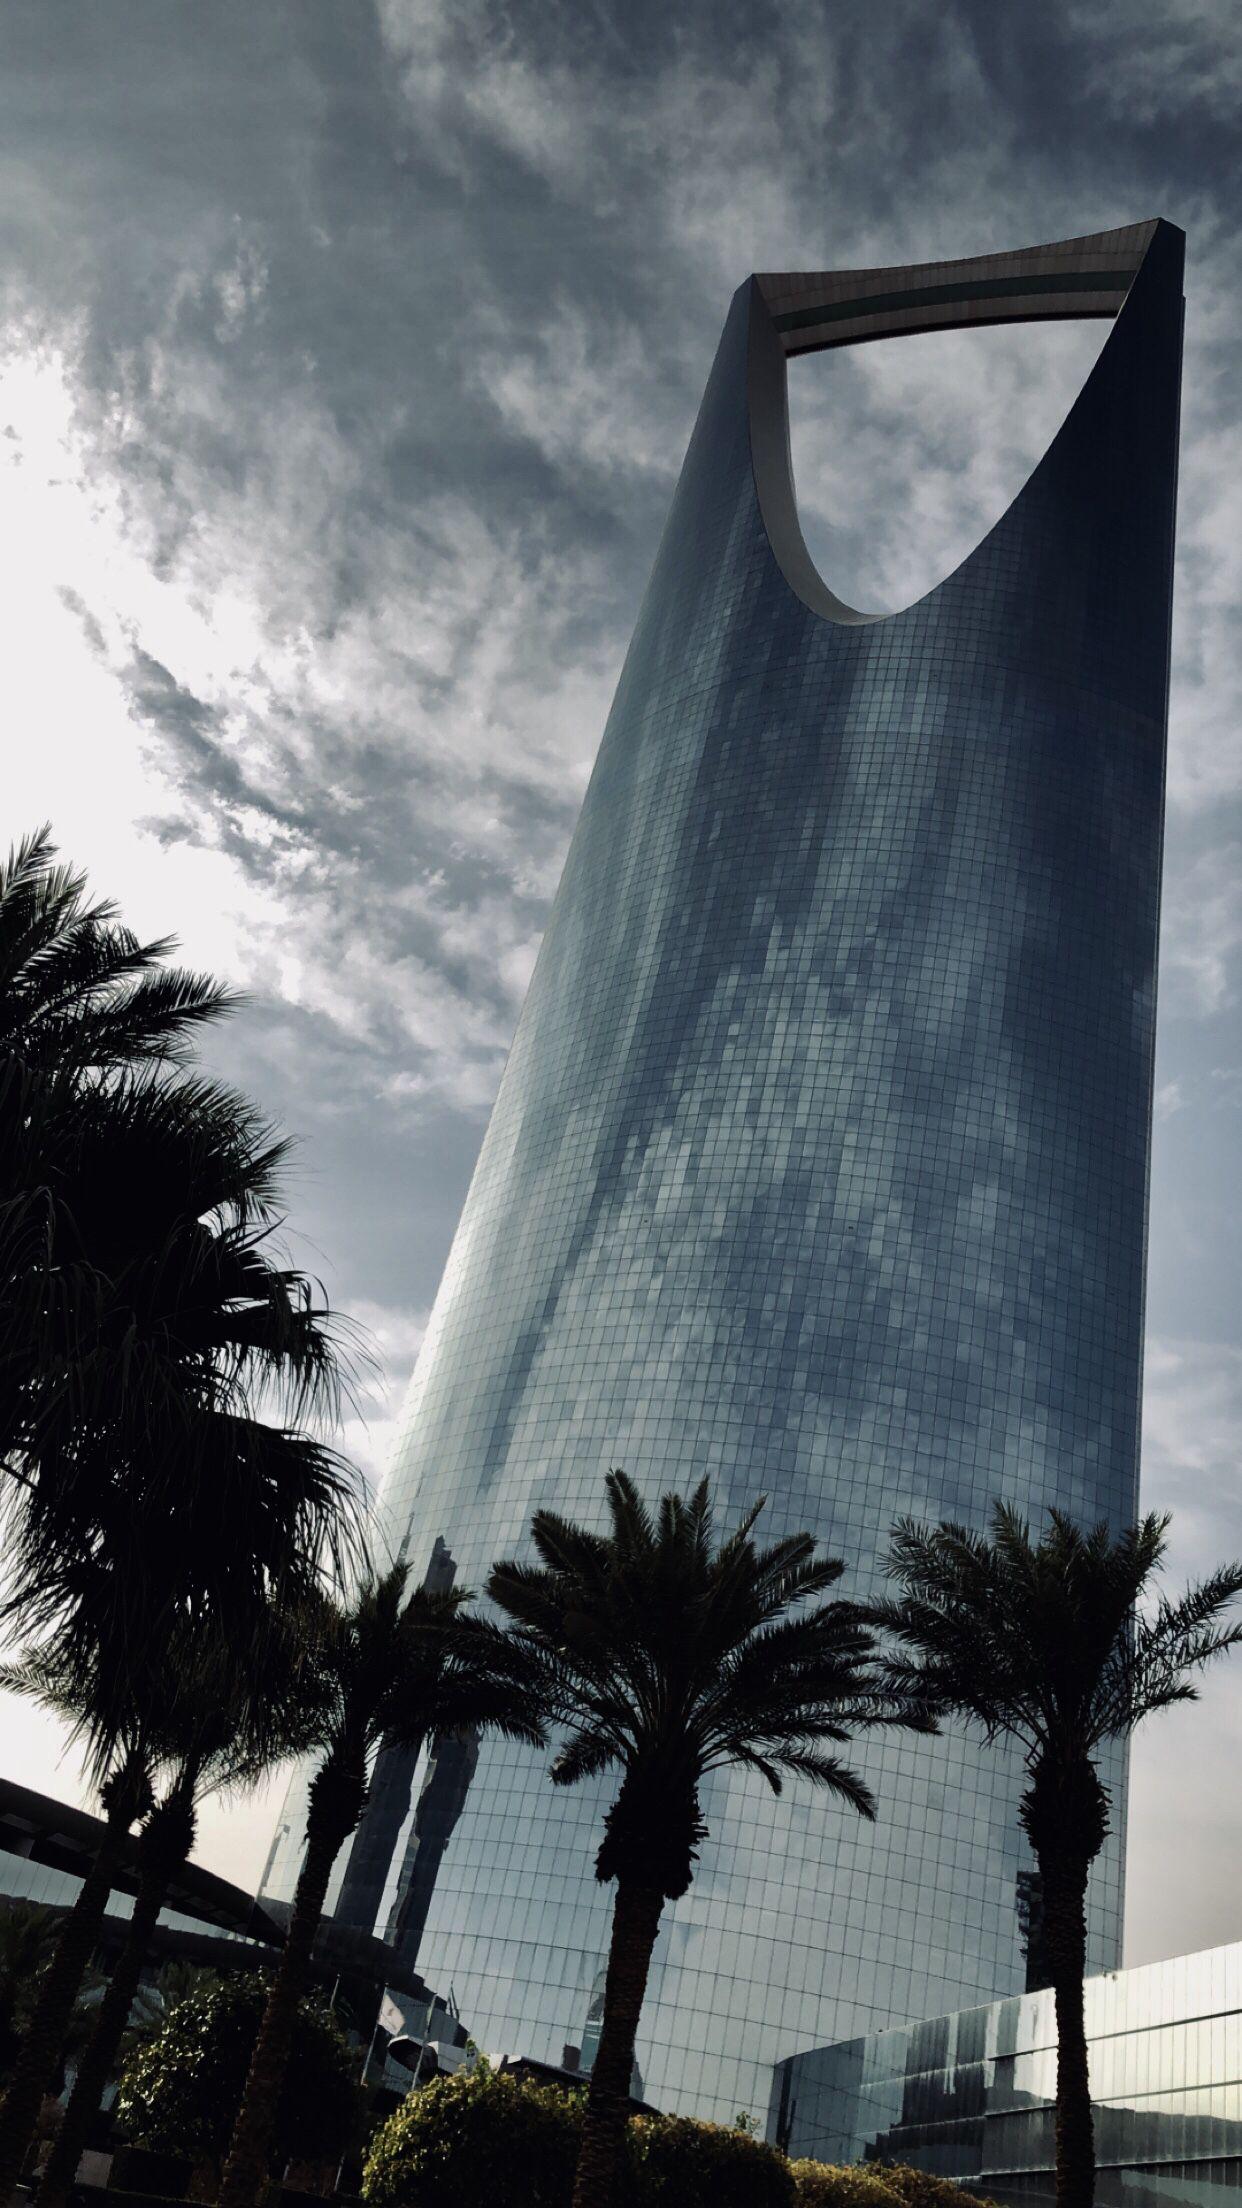 ي جمالك يالعاصمة Saudi Arabia Culture Egypt Art Cute Selfie Ideas